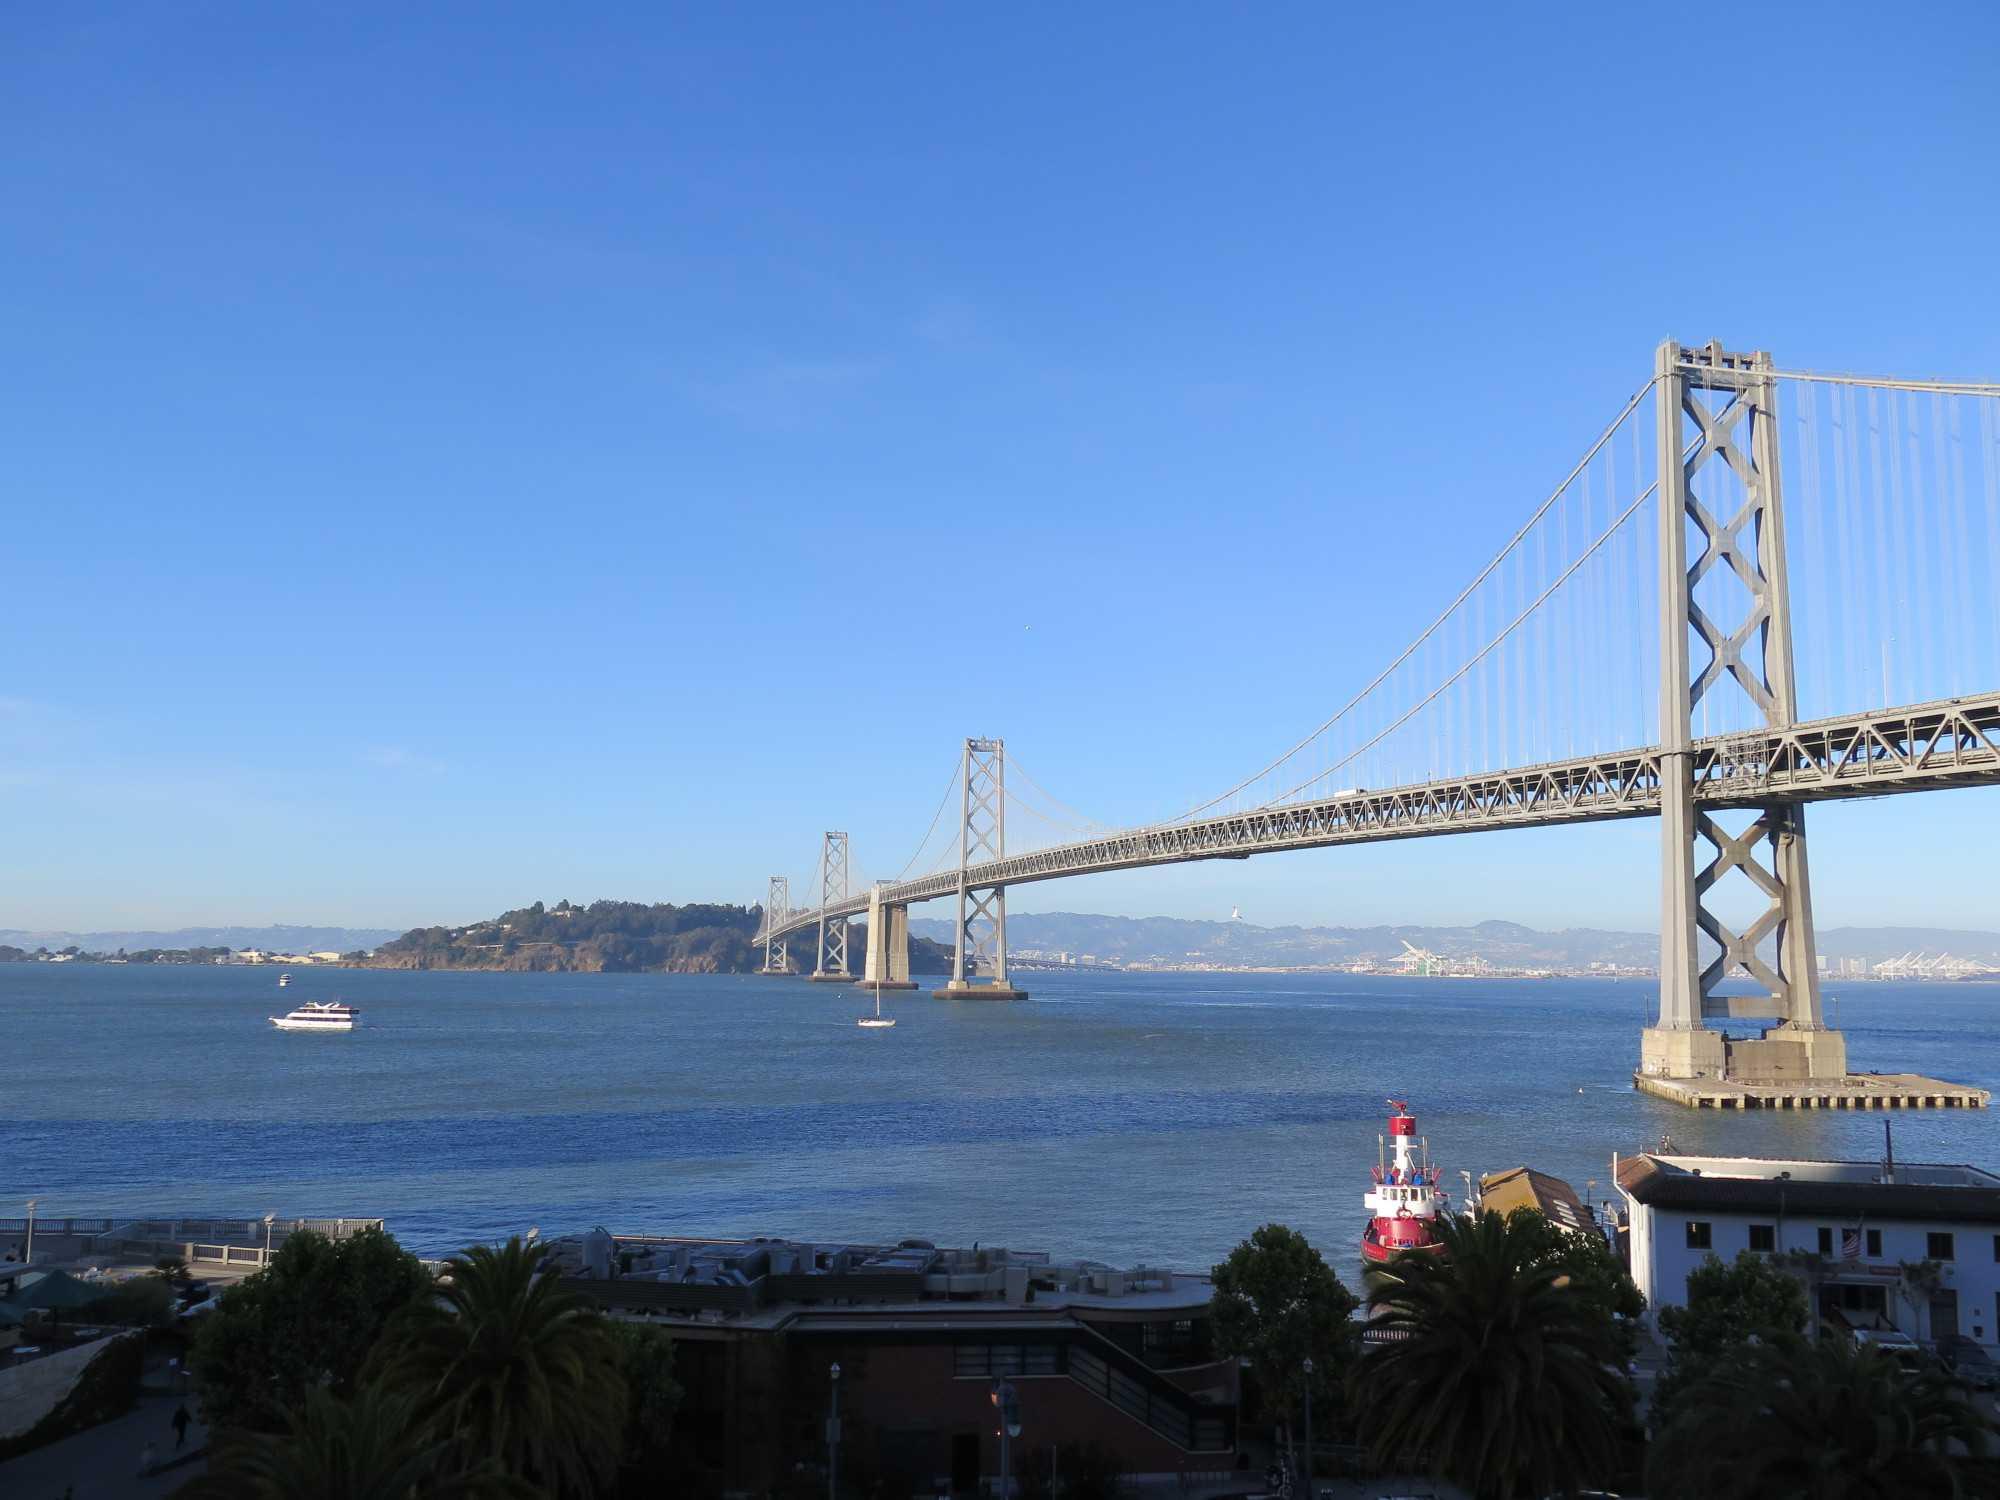 Die Oakland-Bay-Brücke in San Francisco